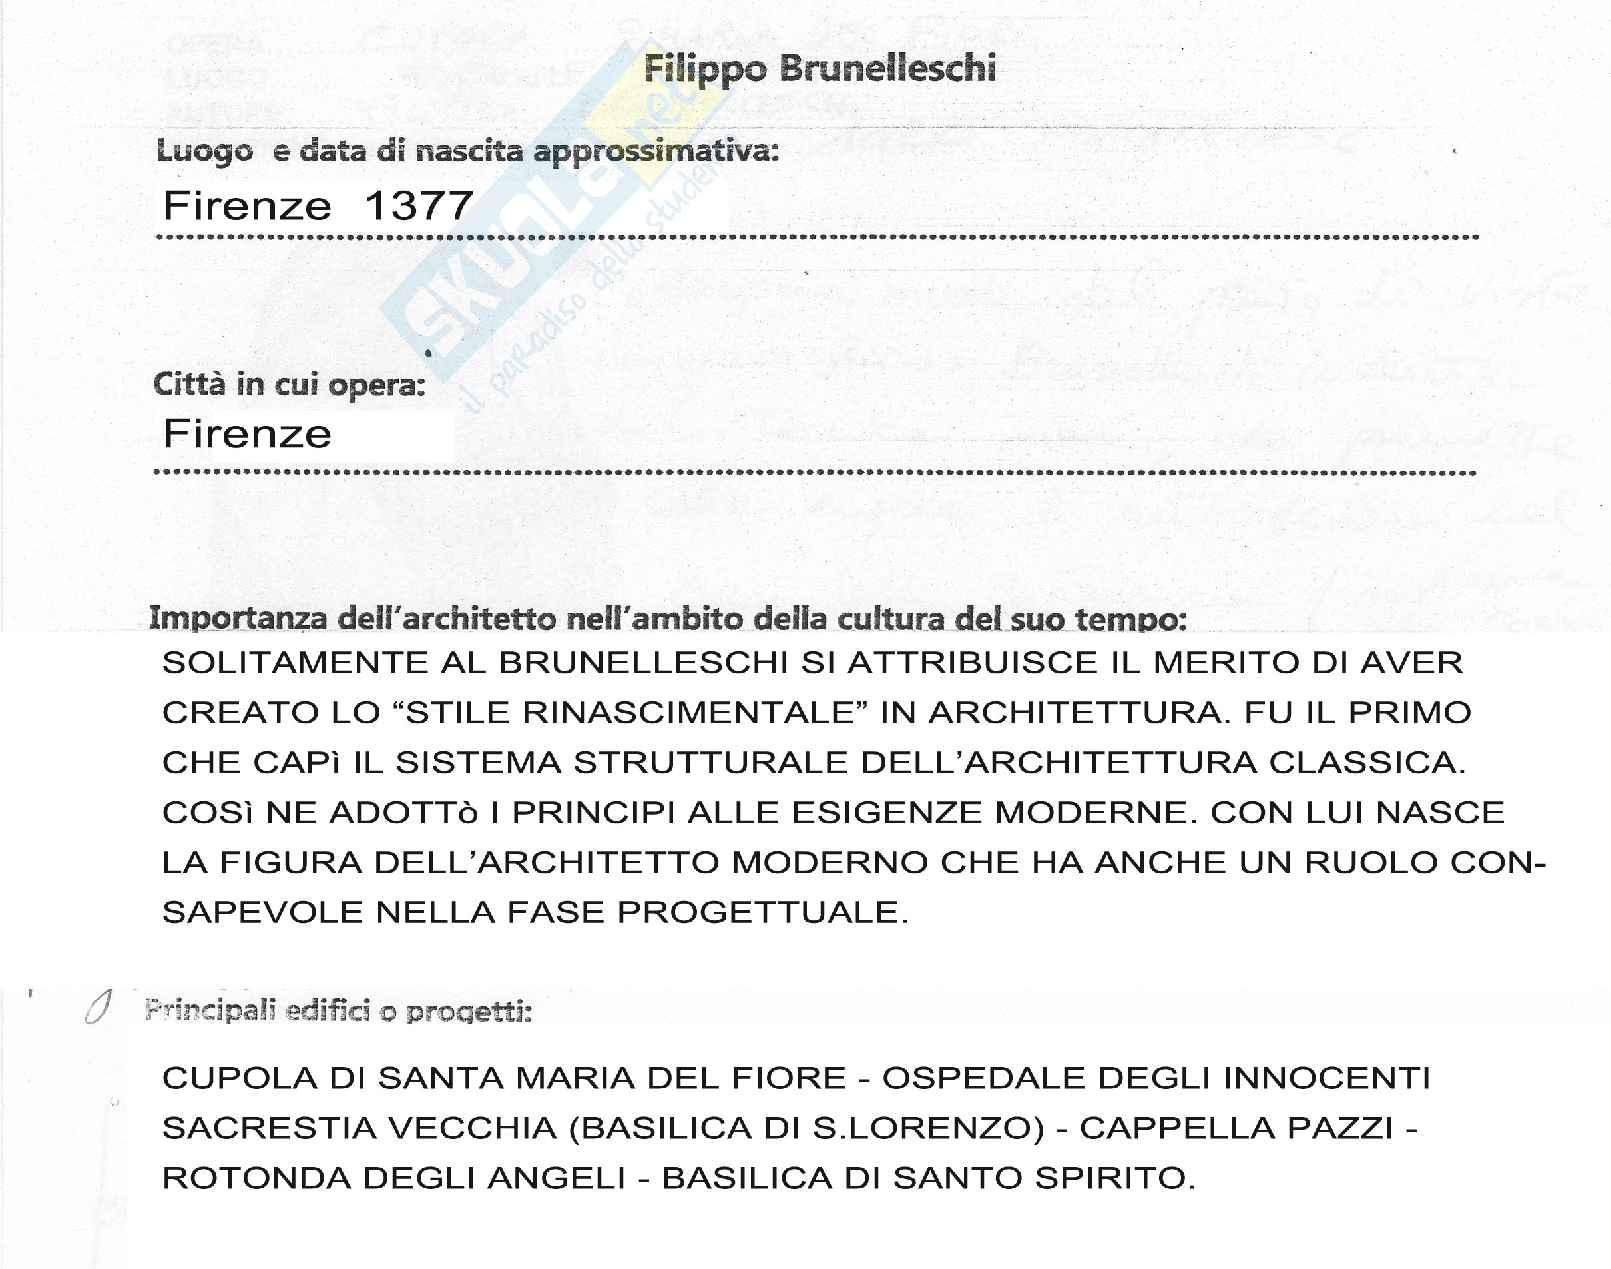 Filippo Brunelleschi, vita e opere